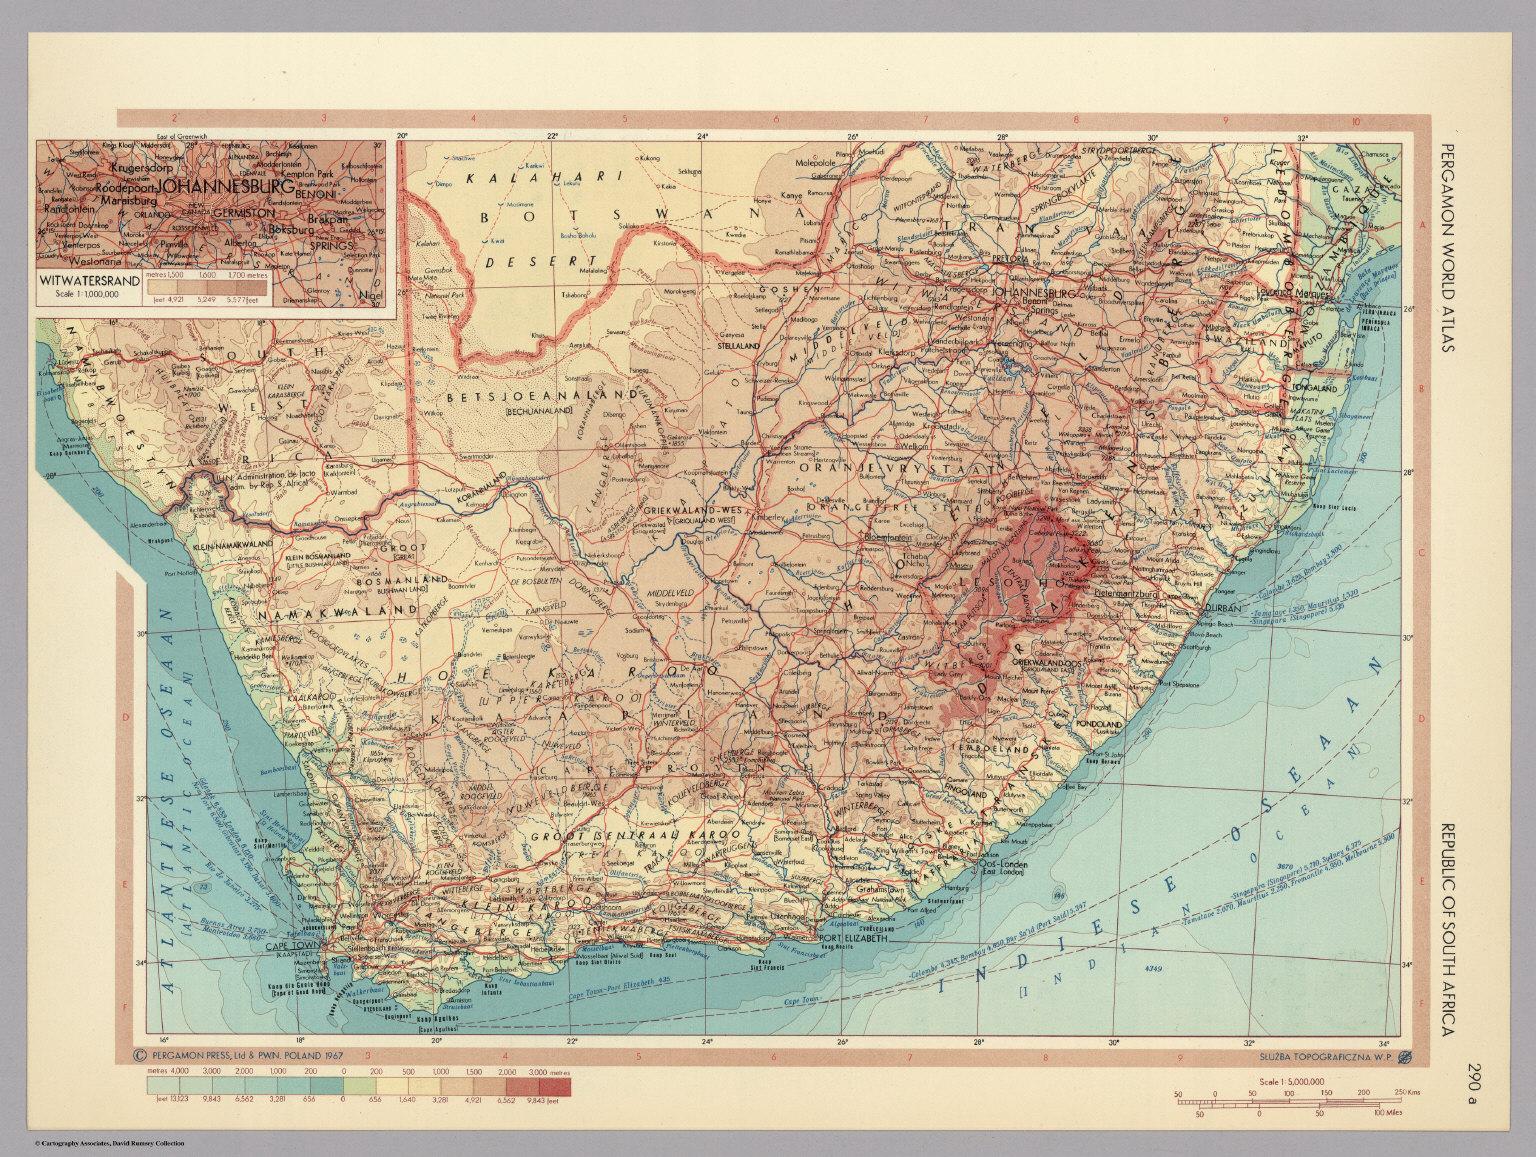 Republic of south africa pergamon world atlas david rumsey republic of south africa pergamon world atlas gumiabroncs Images